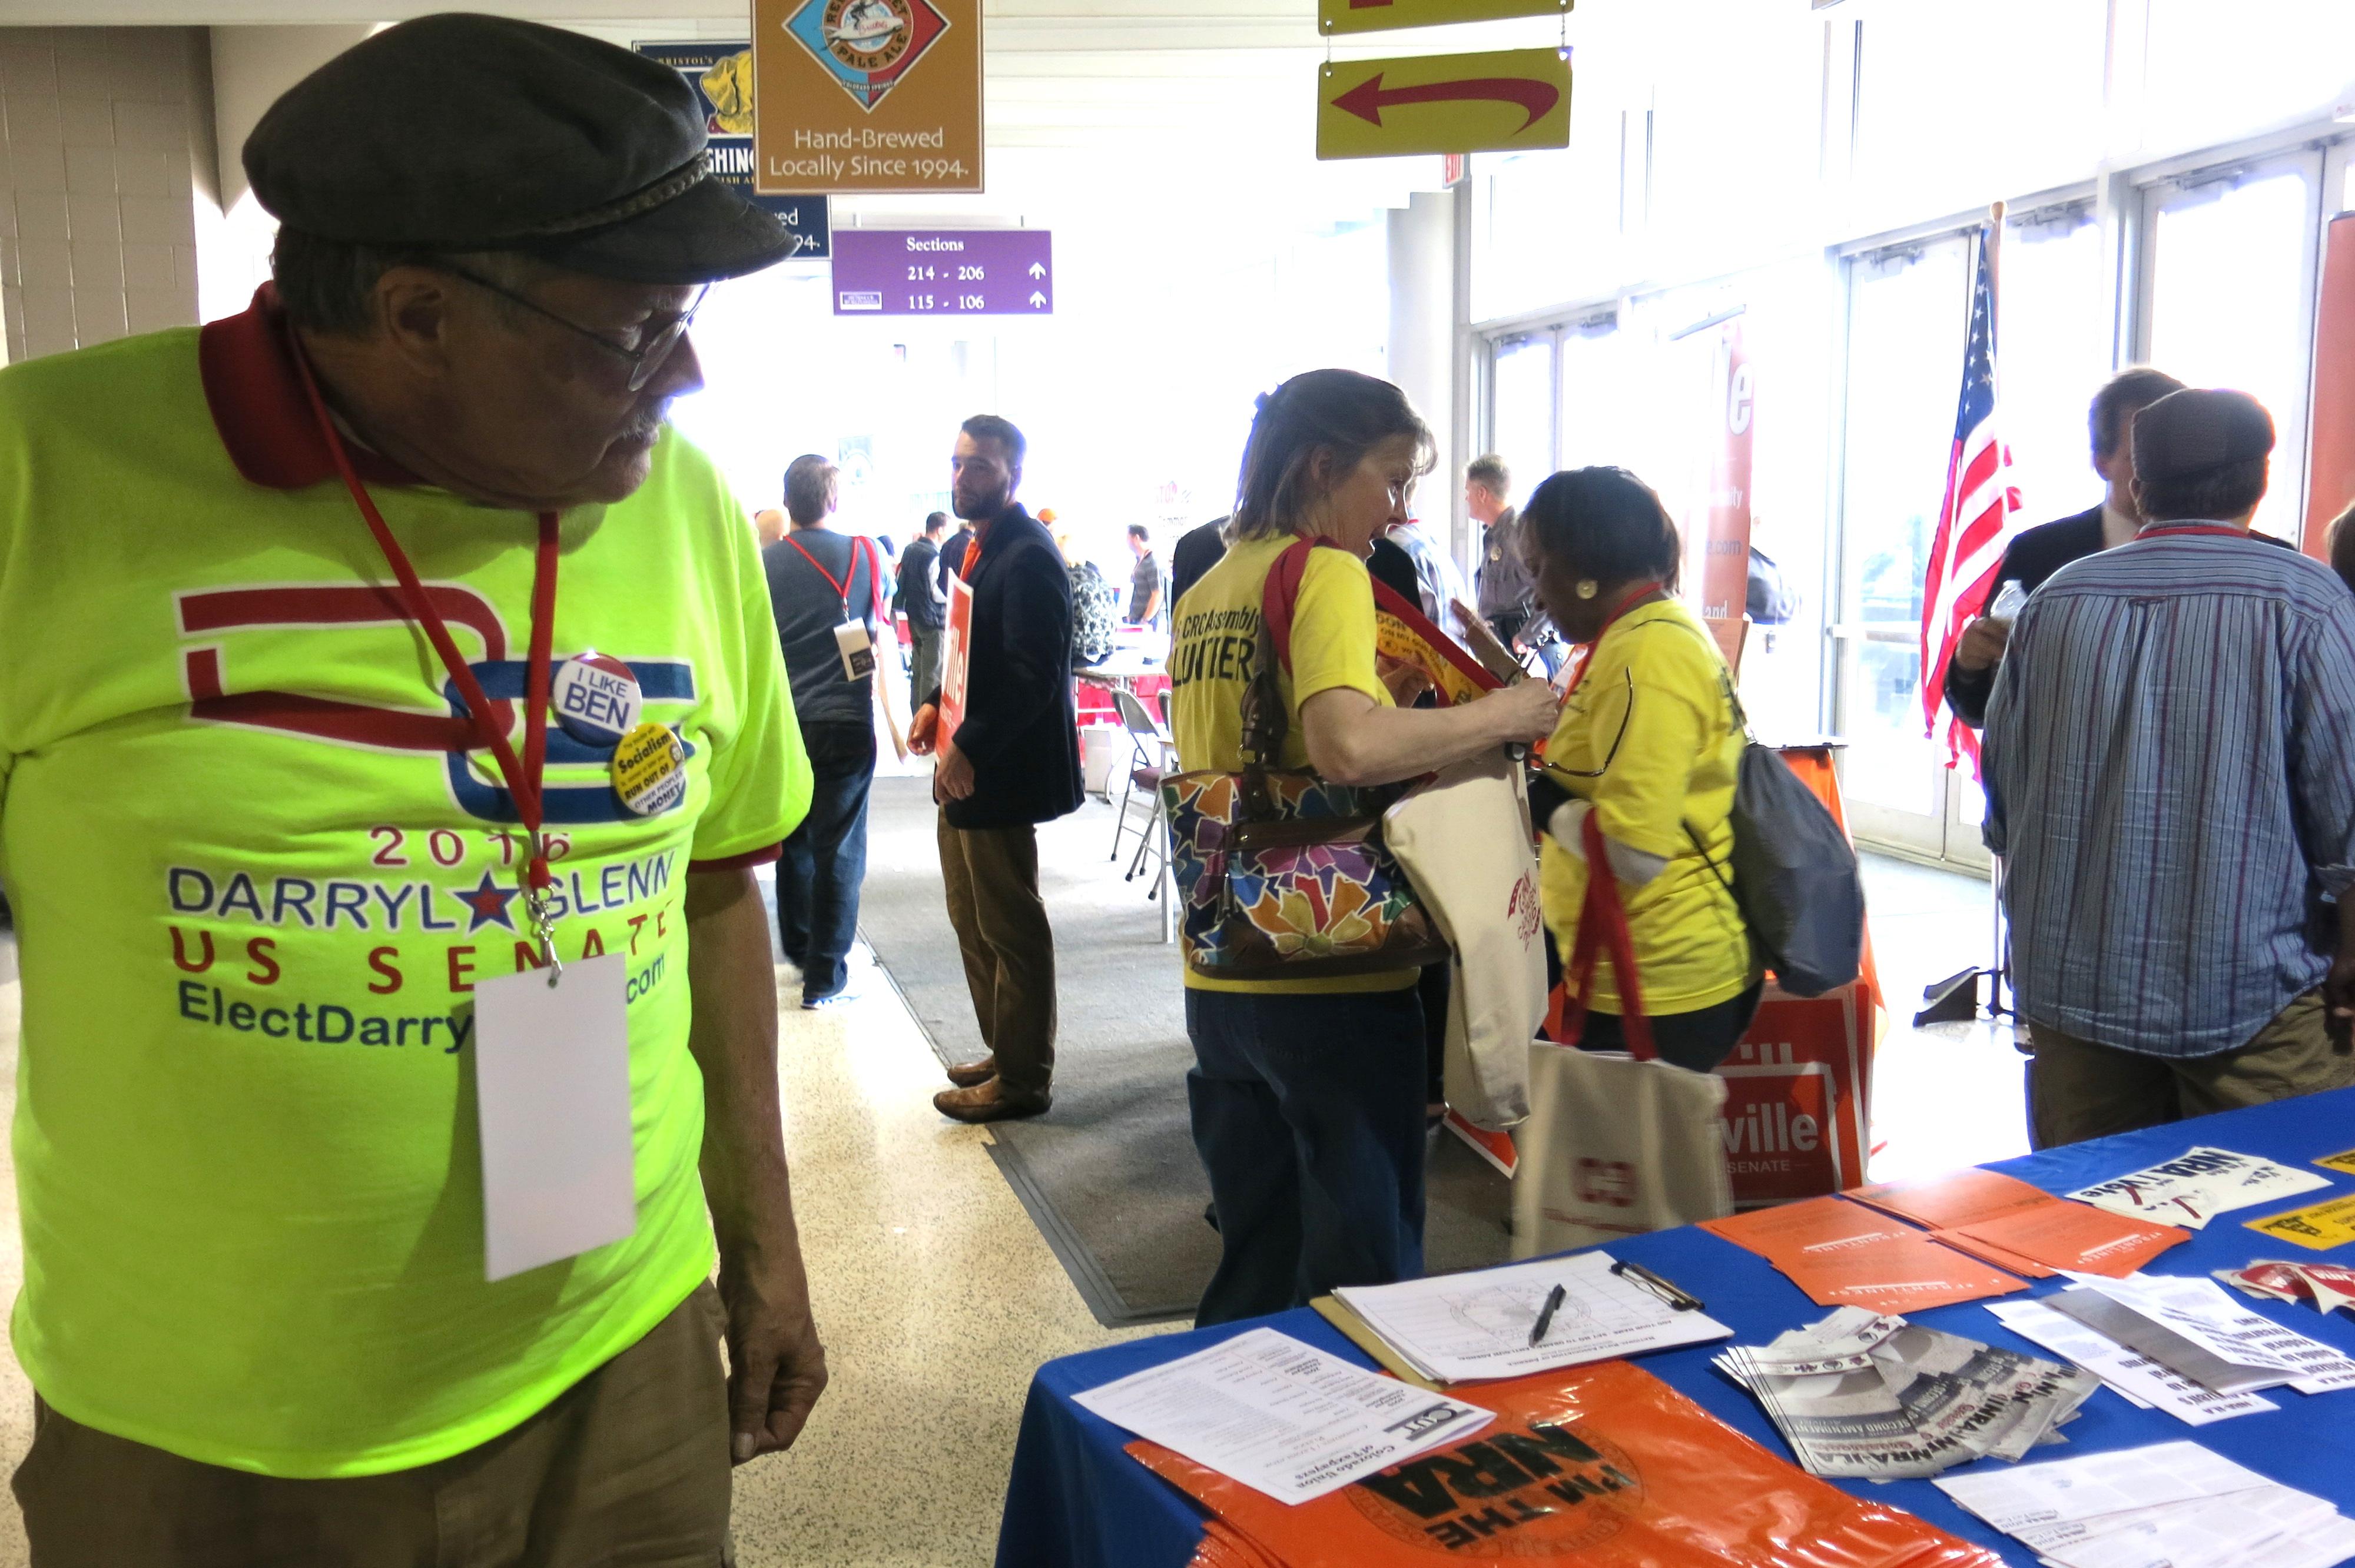 Photo: Darryl Glenn supporter, CO GOP convention